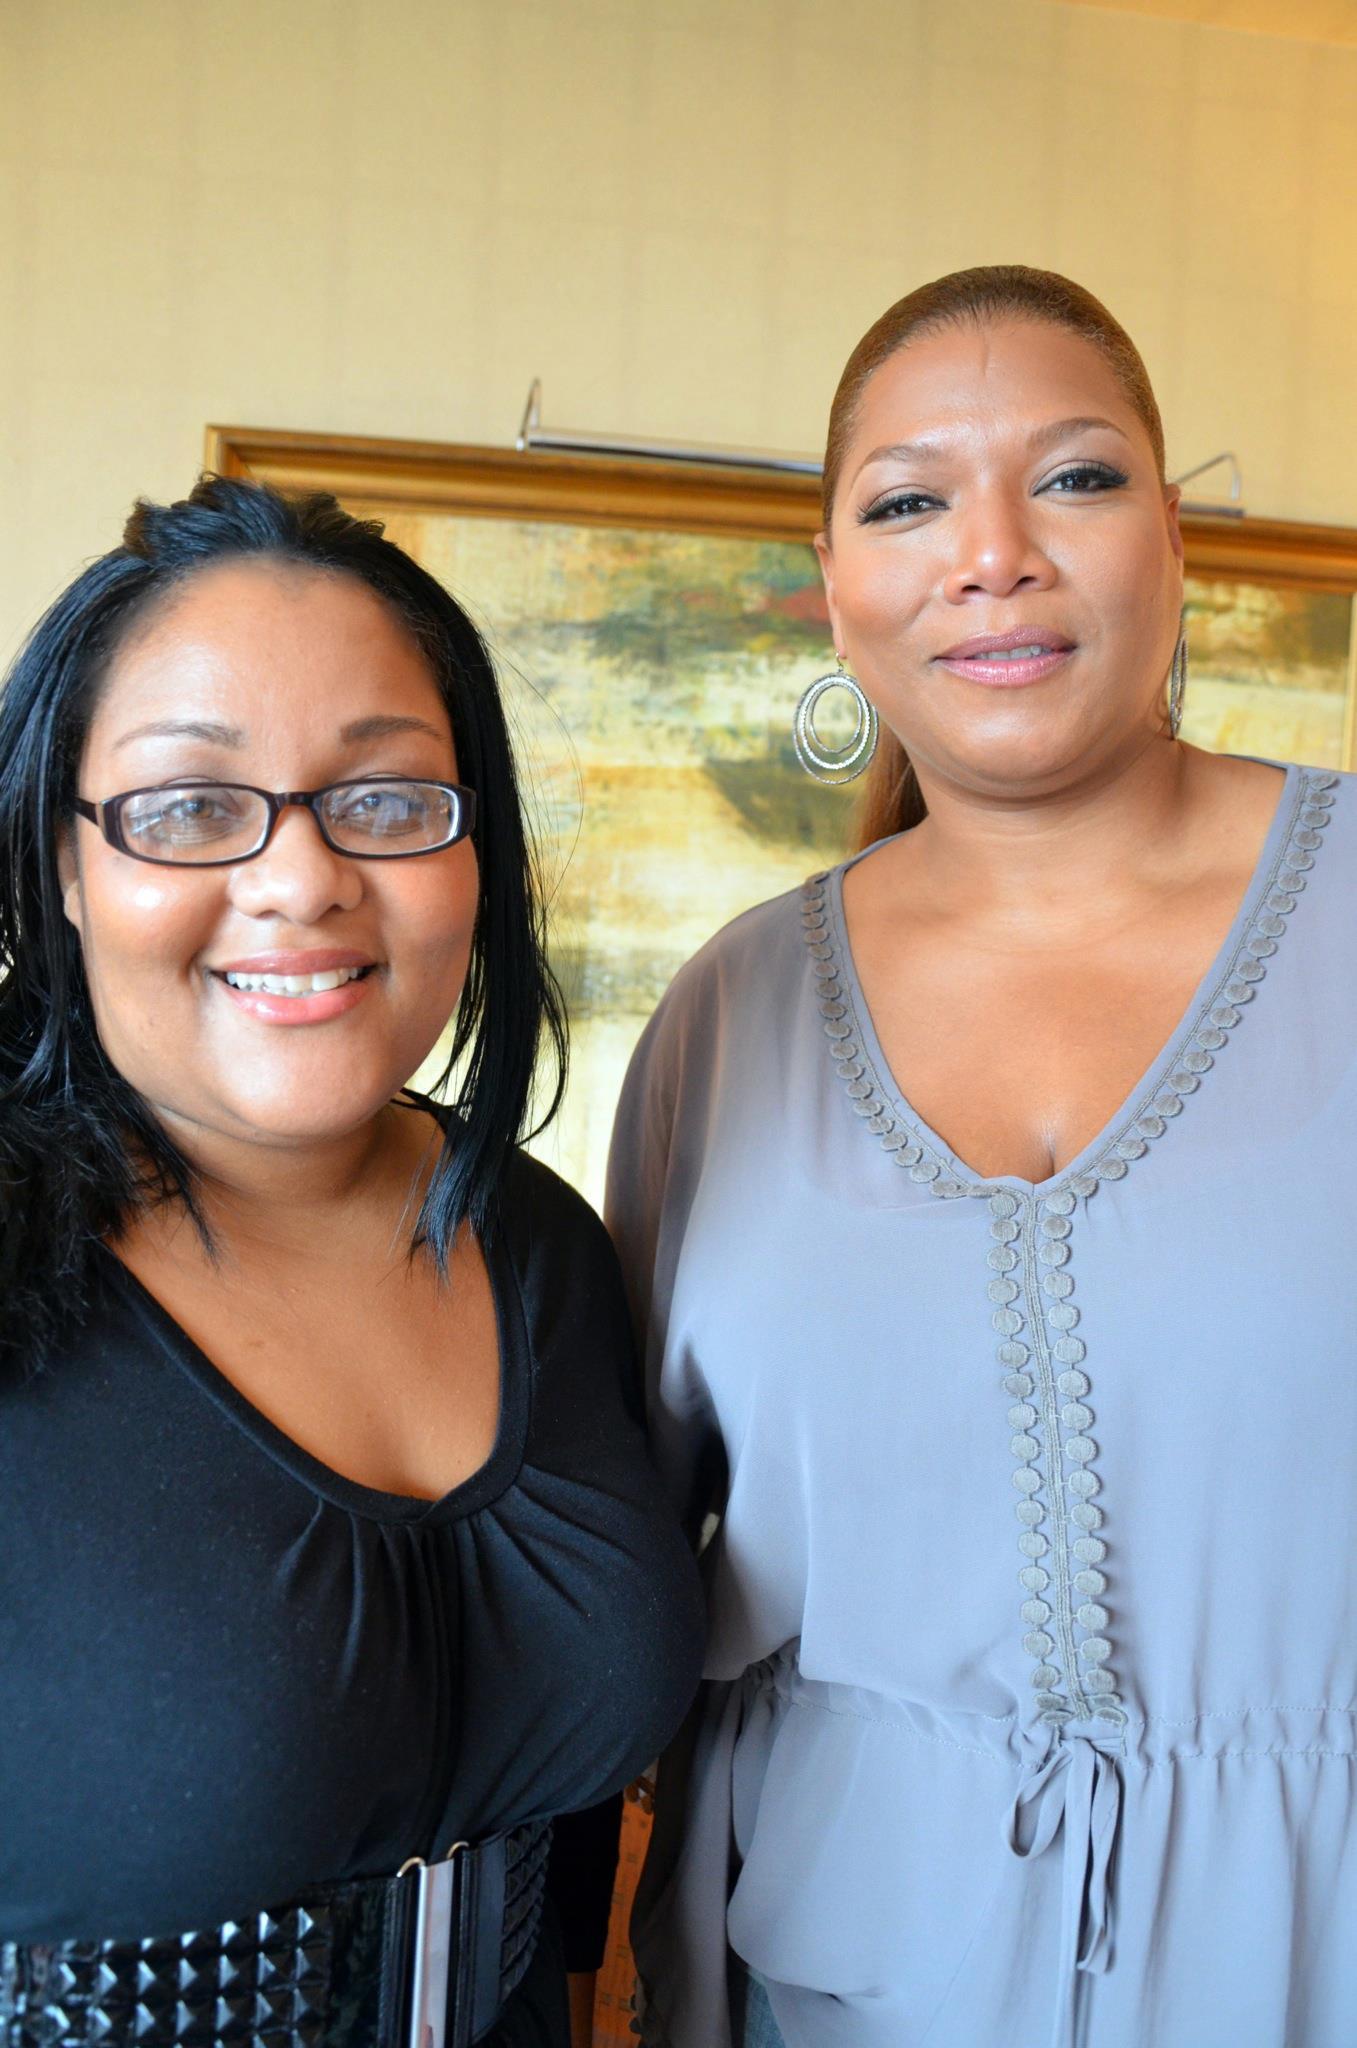 Part 3: Krystel from Army Wife 101 Interviews Queen Latifah {Video}